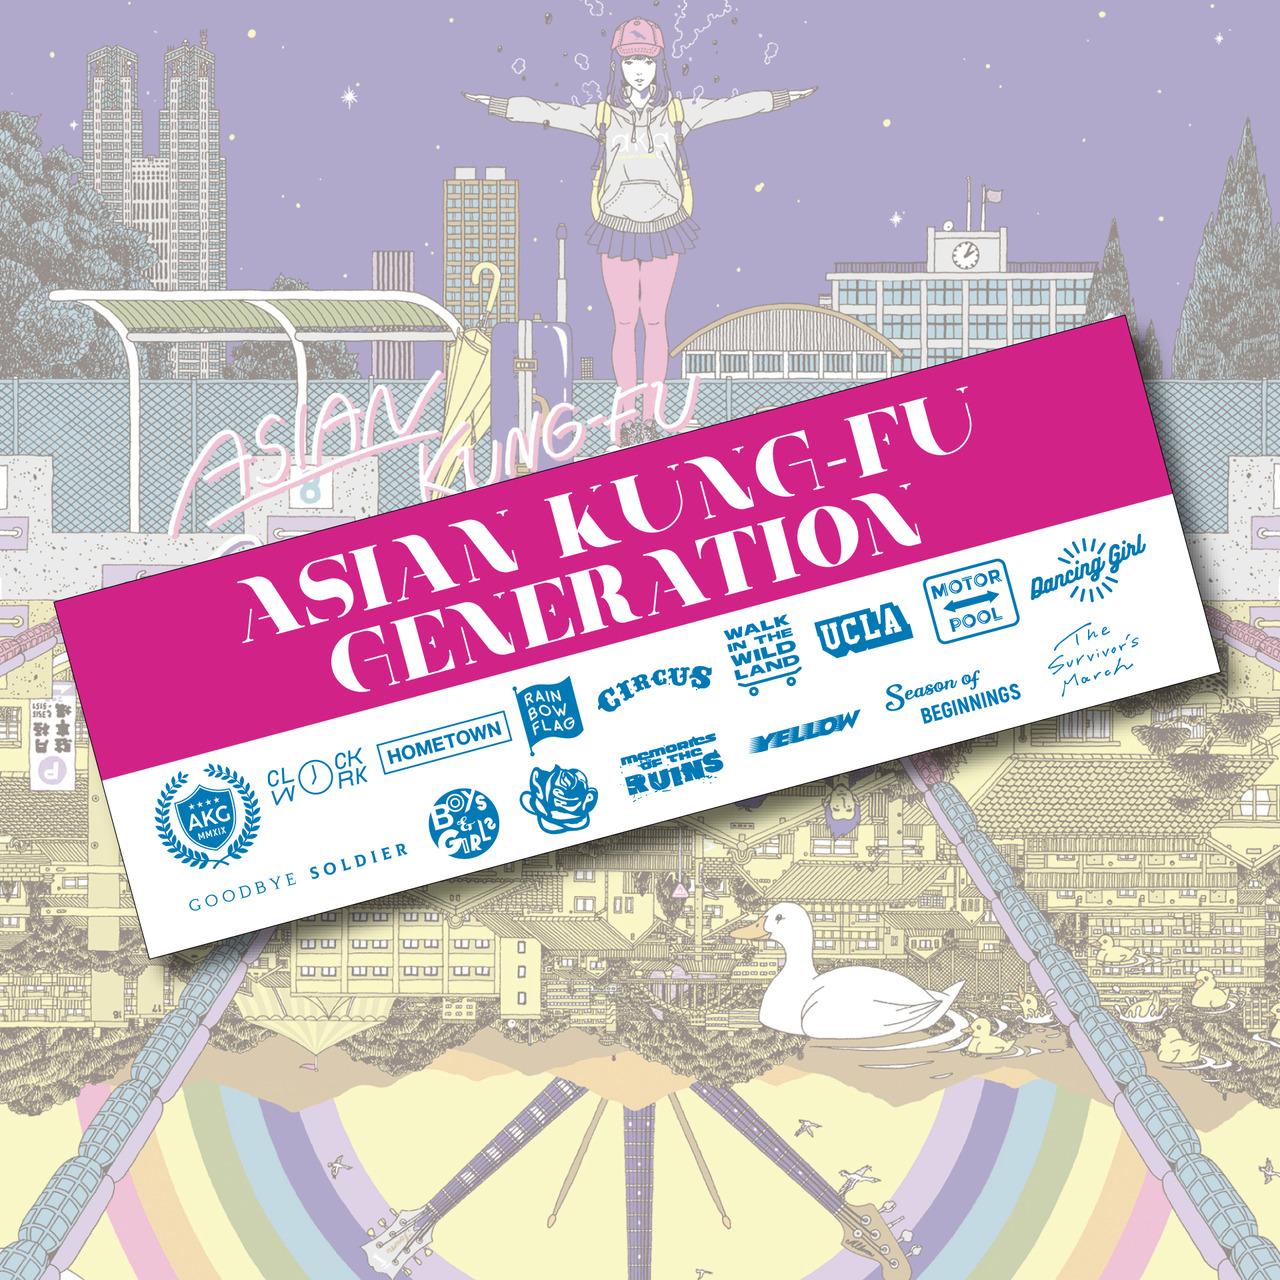 ASIAN KUNG-FU GENERATION GOODS Tour 2019 「ホームタウン」